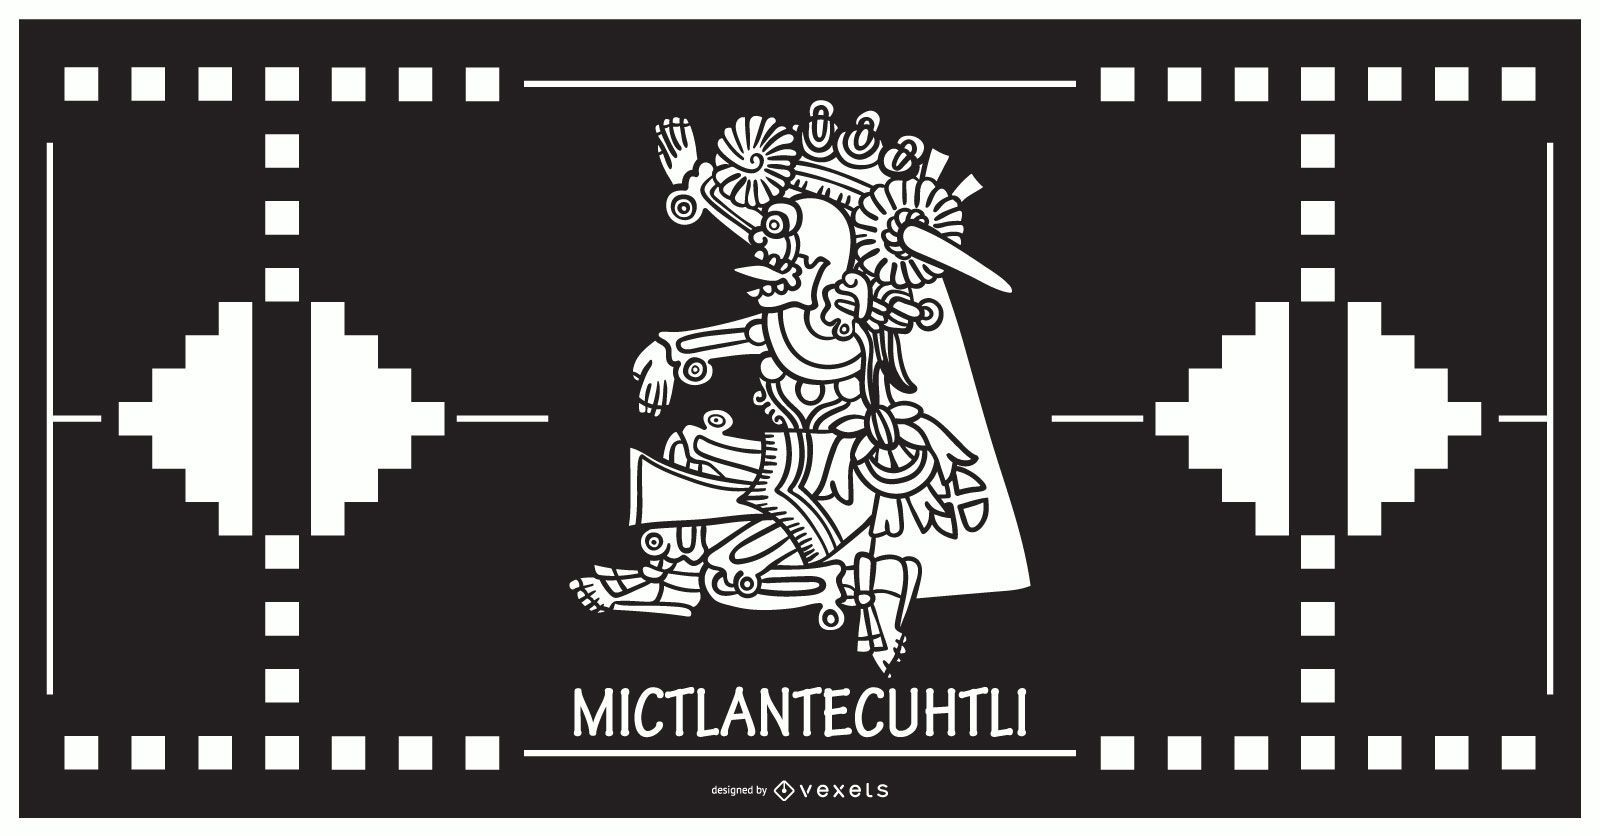 Diseño de dios azteca mictlantecuhtli